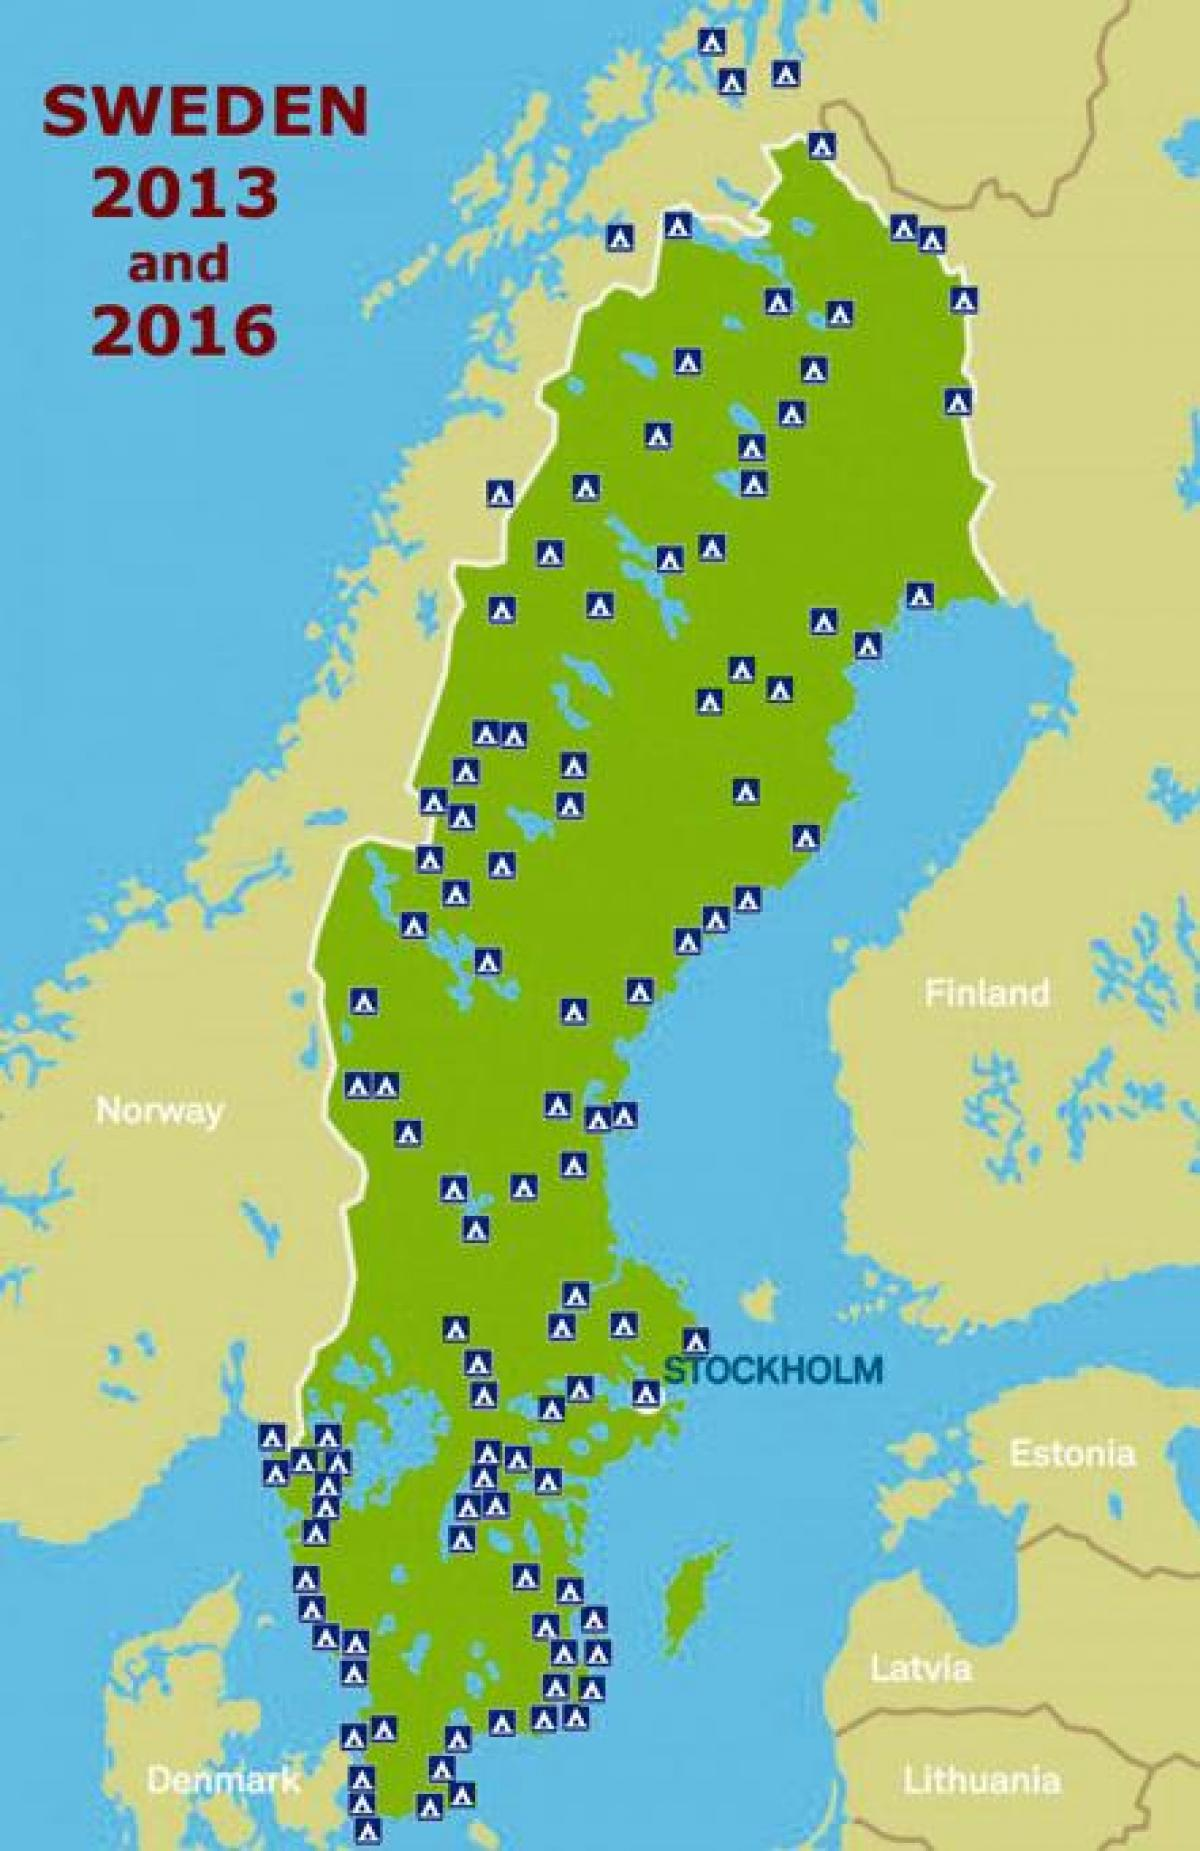 camping sverige karta Camping Sverige karta   Sveriges camping karta (Norra Europa   Europa) camping sverige karta